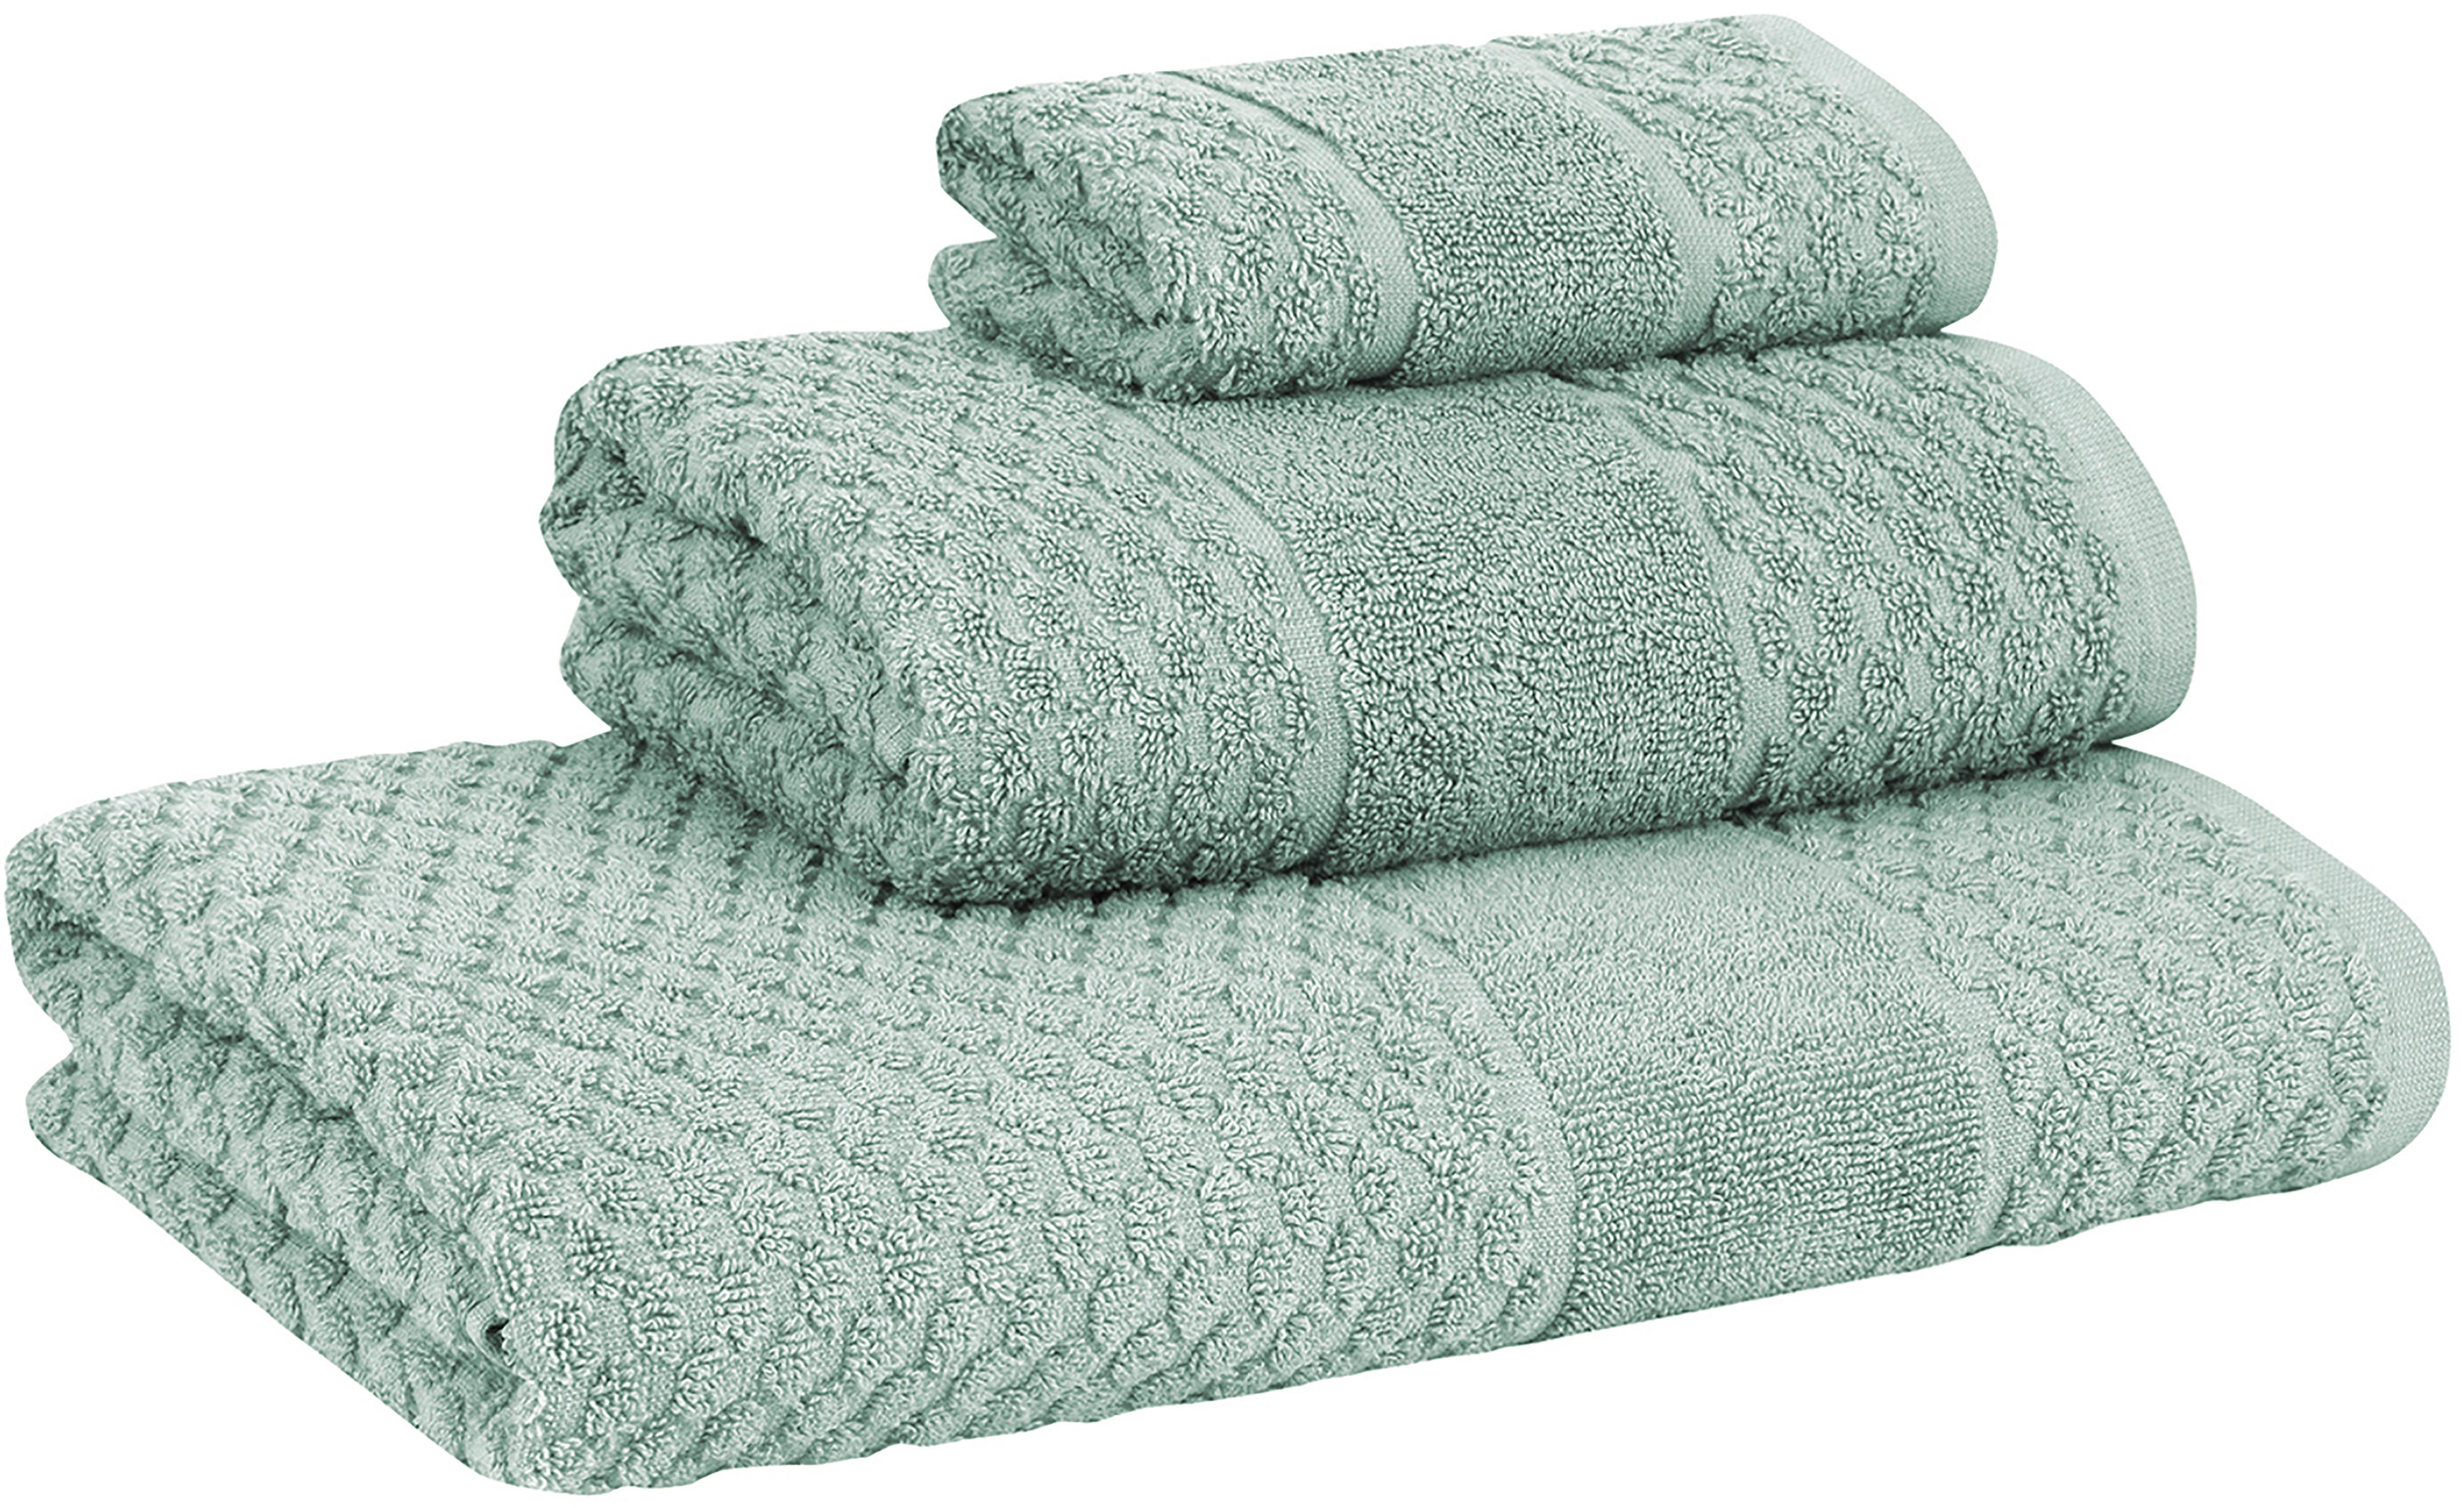 Set de toallas texturizada Katharina, 3pzas., Verde menta, Set de diferentes tamaños